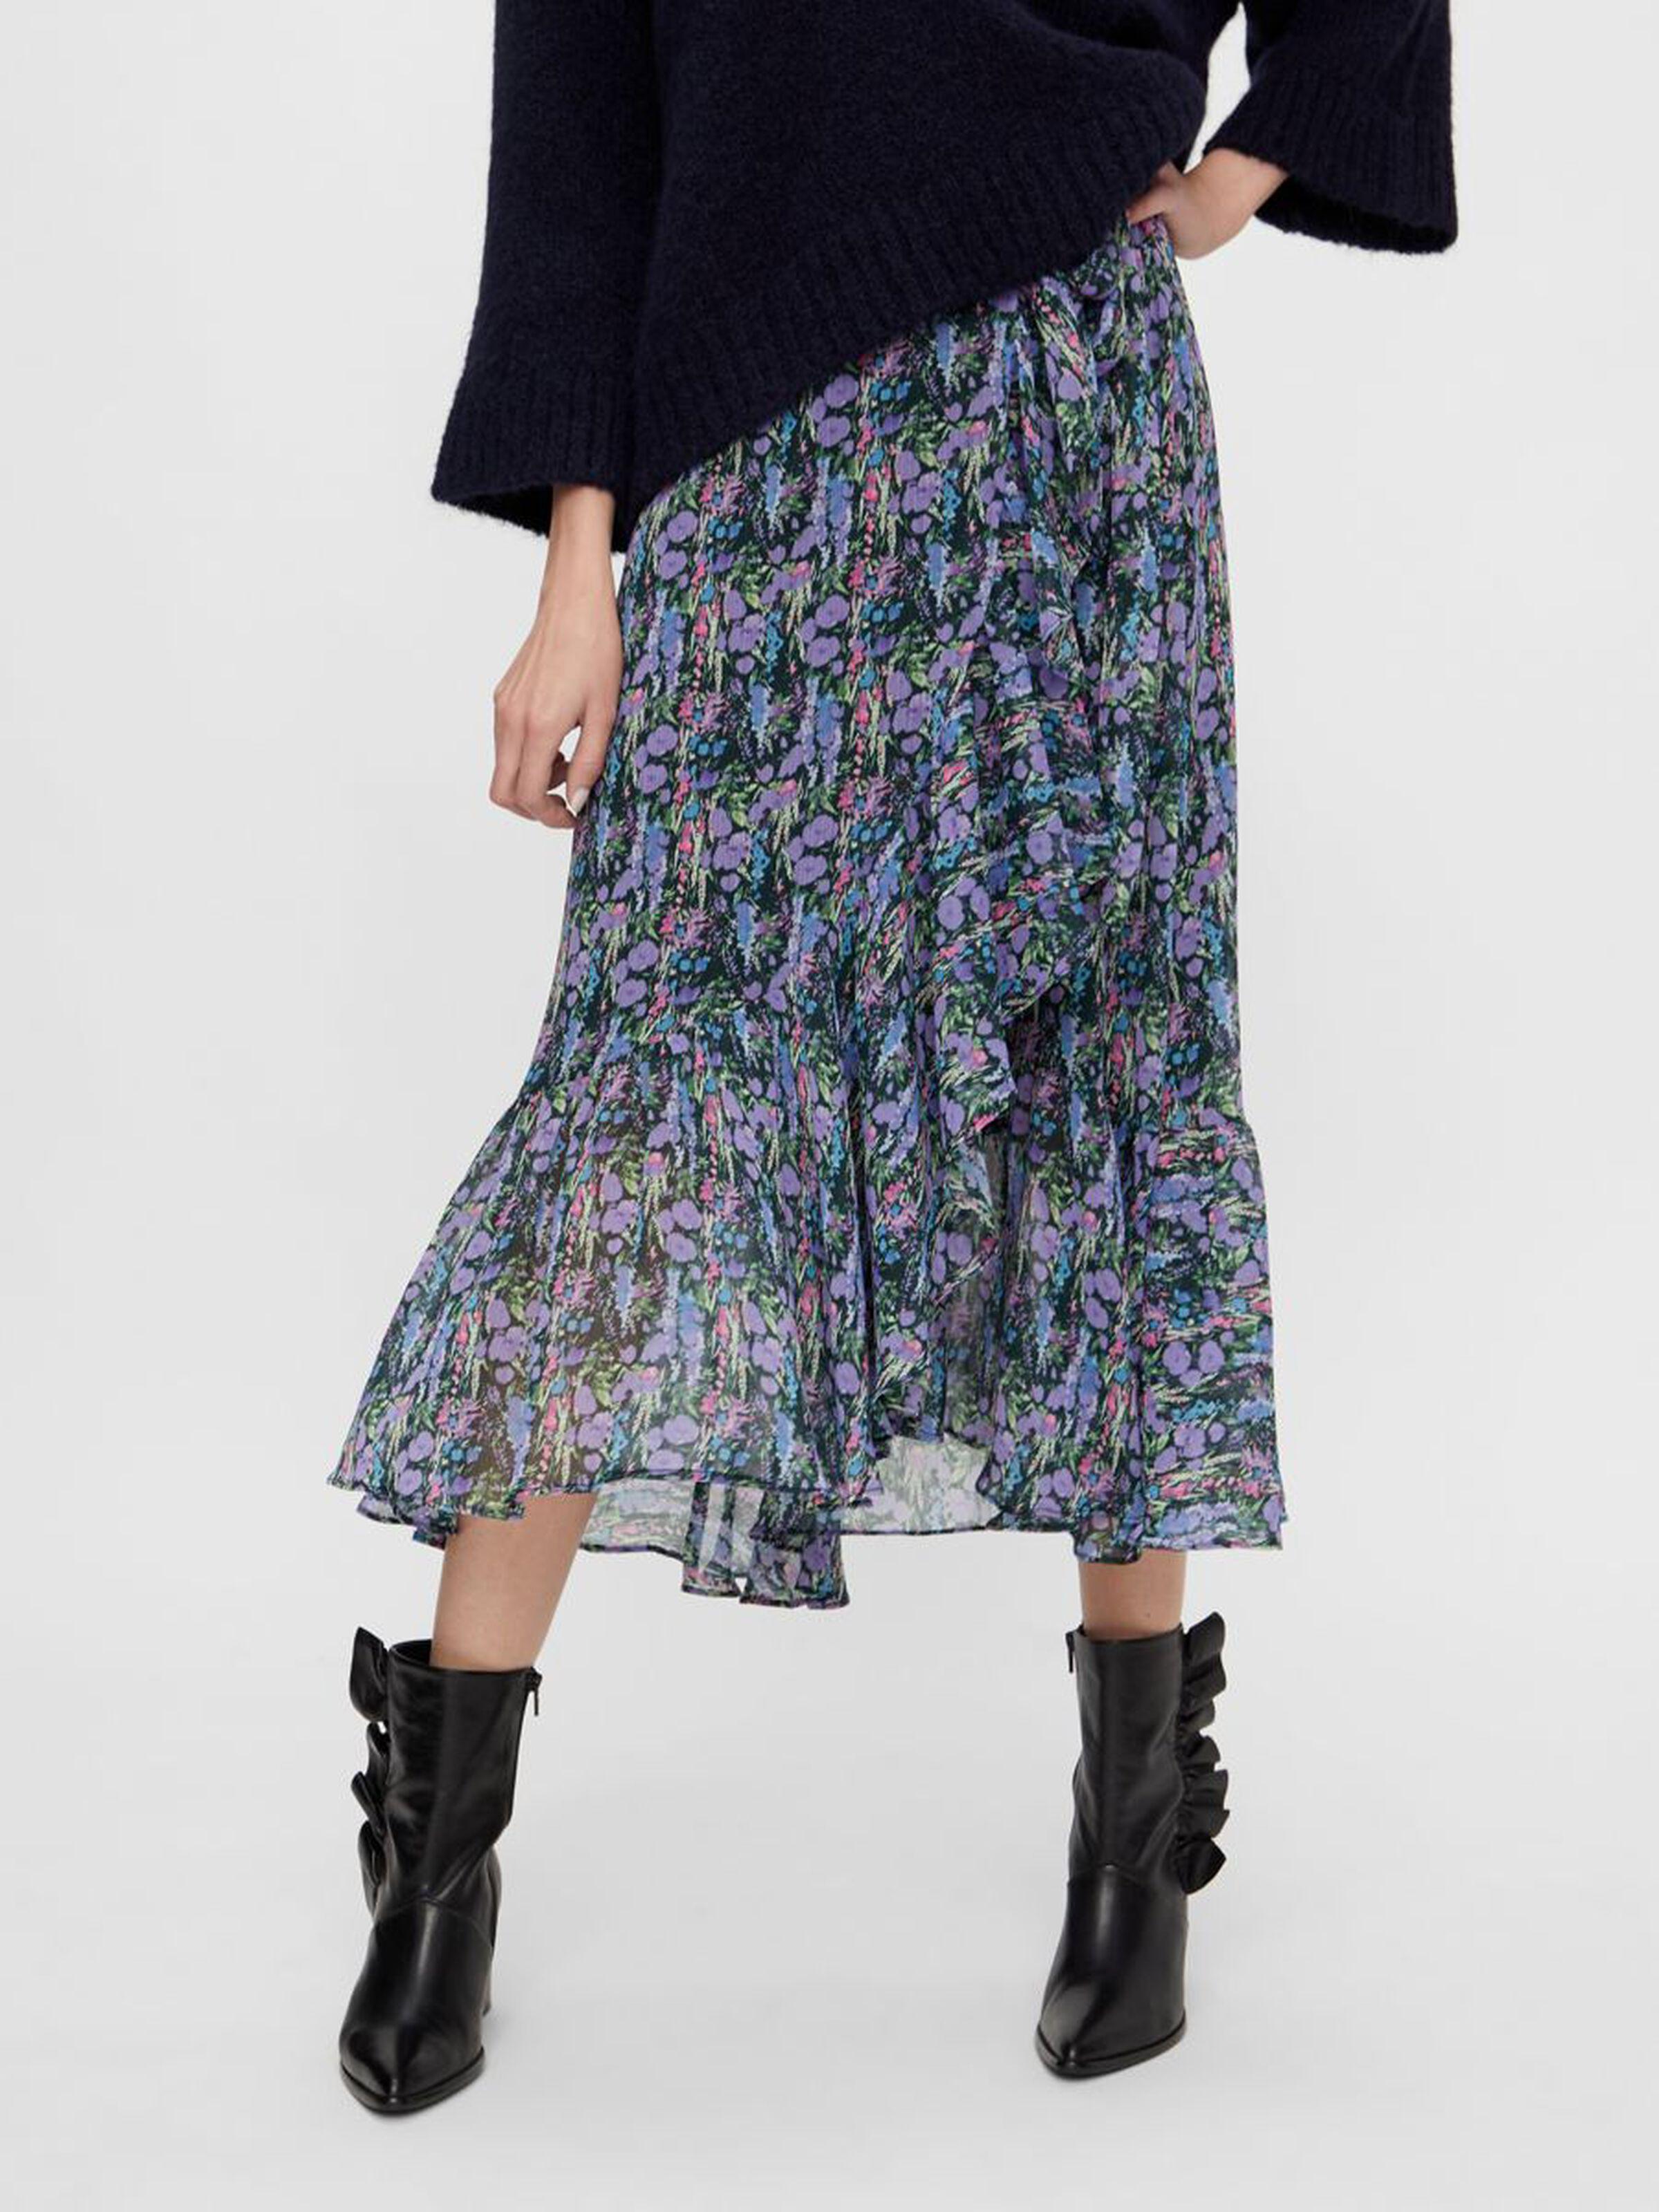 Esmeralda Floral Wrap Midi Skirt